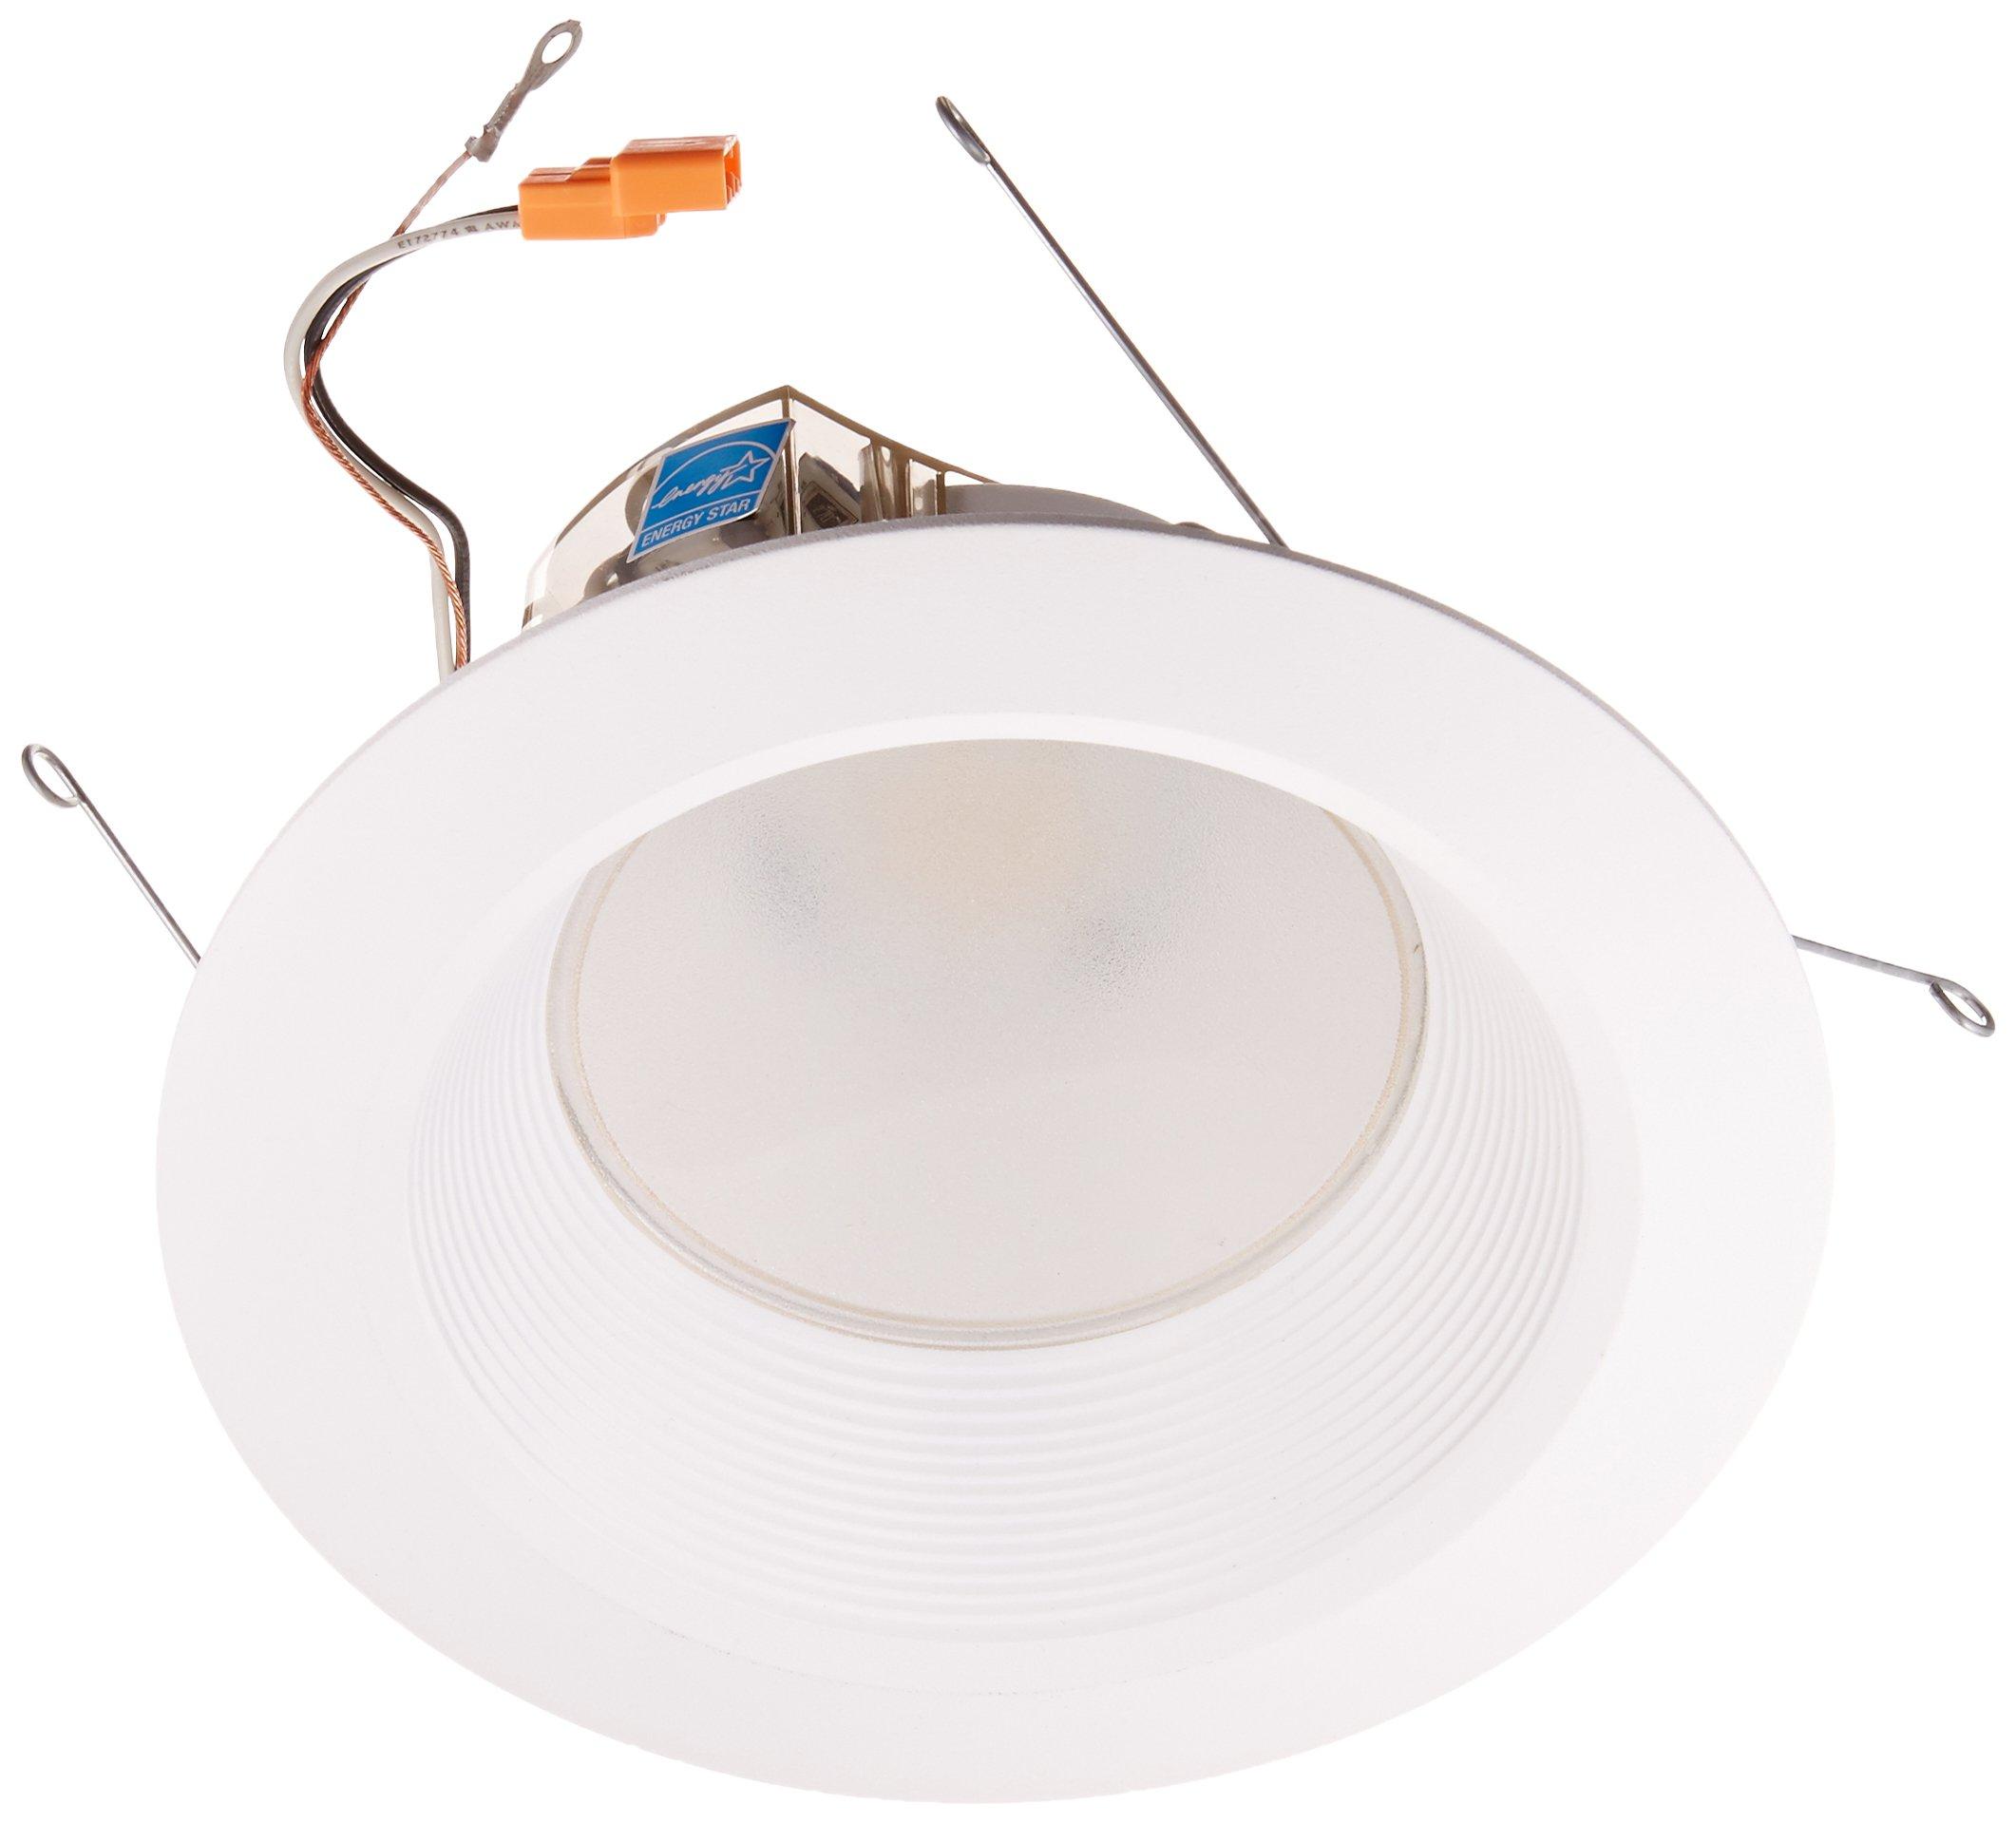 Lithonia Lighting 6BPMW LED 27K 90CRI M6 5/6 Inch 16W White High Output LED Recessed Baffle Module, 2700K